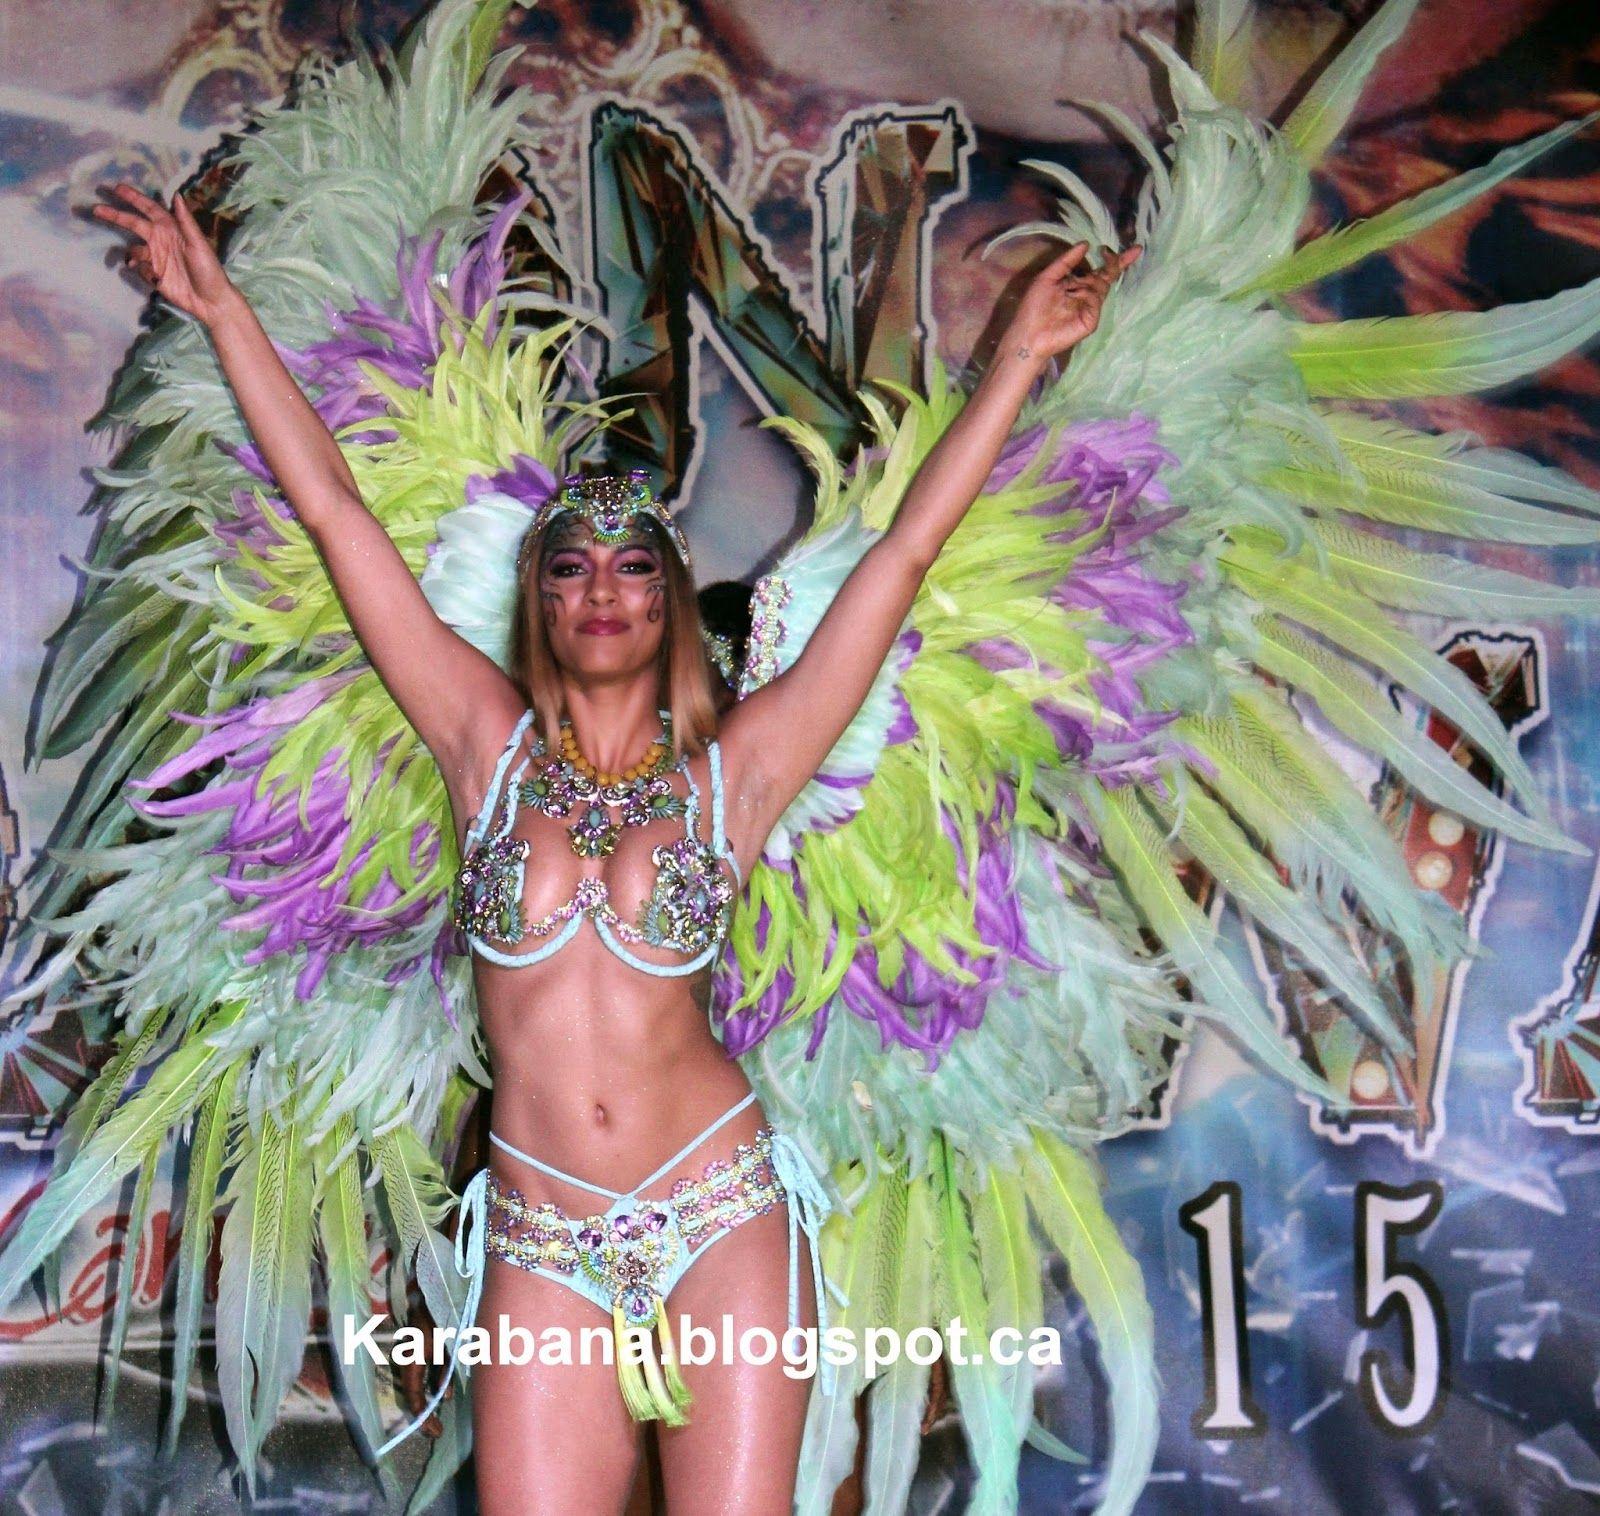 Karabana carnival nationz on broadway band launch anything karabana carnival nationz on broadway band launch malvernweather Gallery